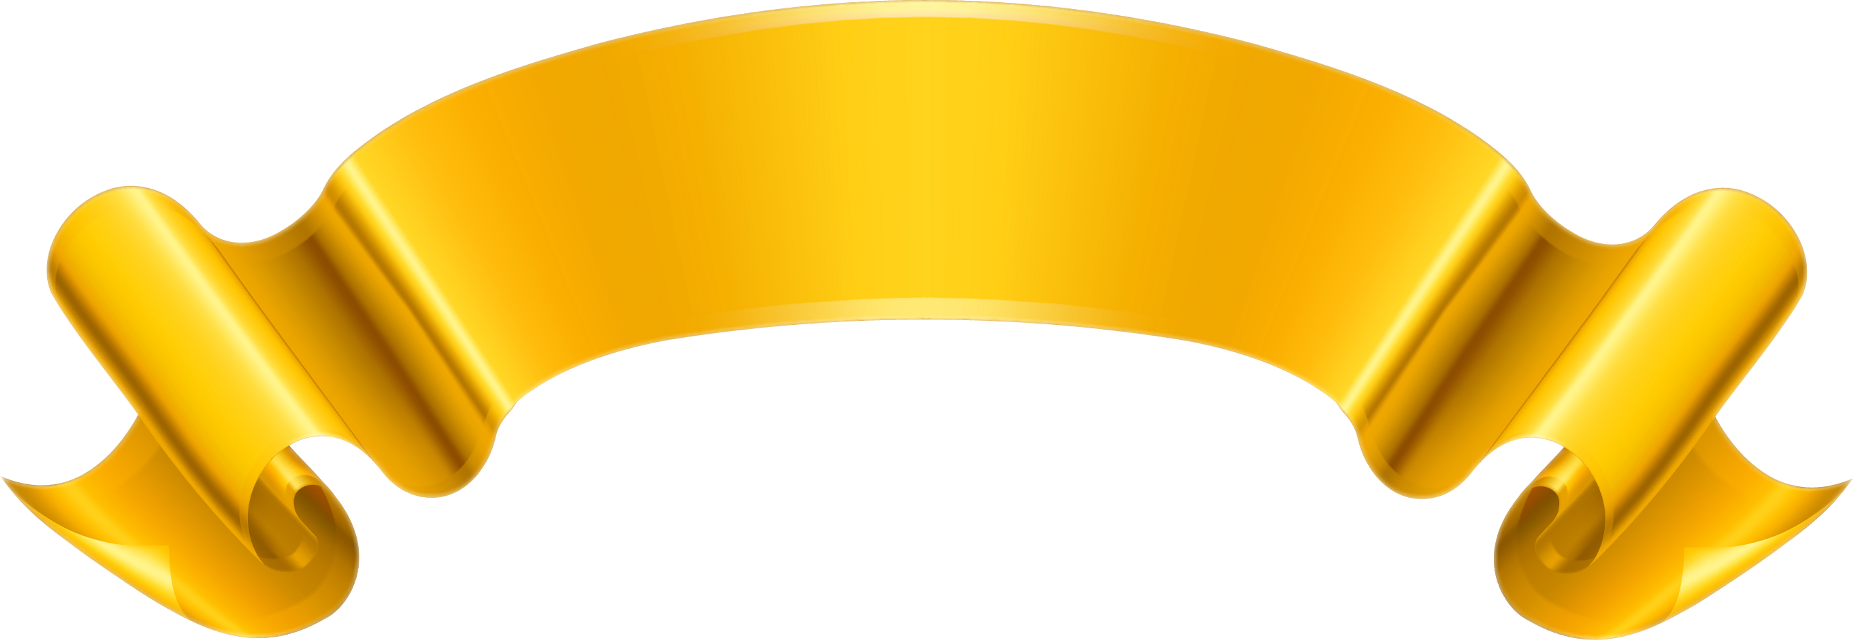 #goldsticker #gold #goldbanner #goldbannersticker #banner #bannersticker #gildribbon #ribbon #ribbonsticker